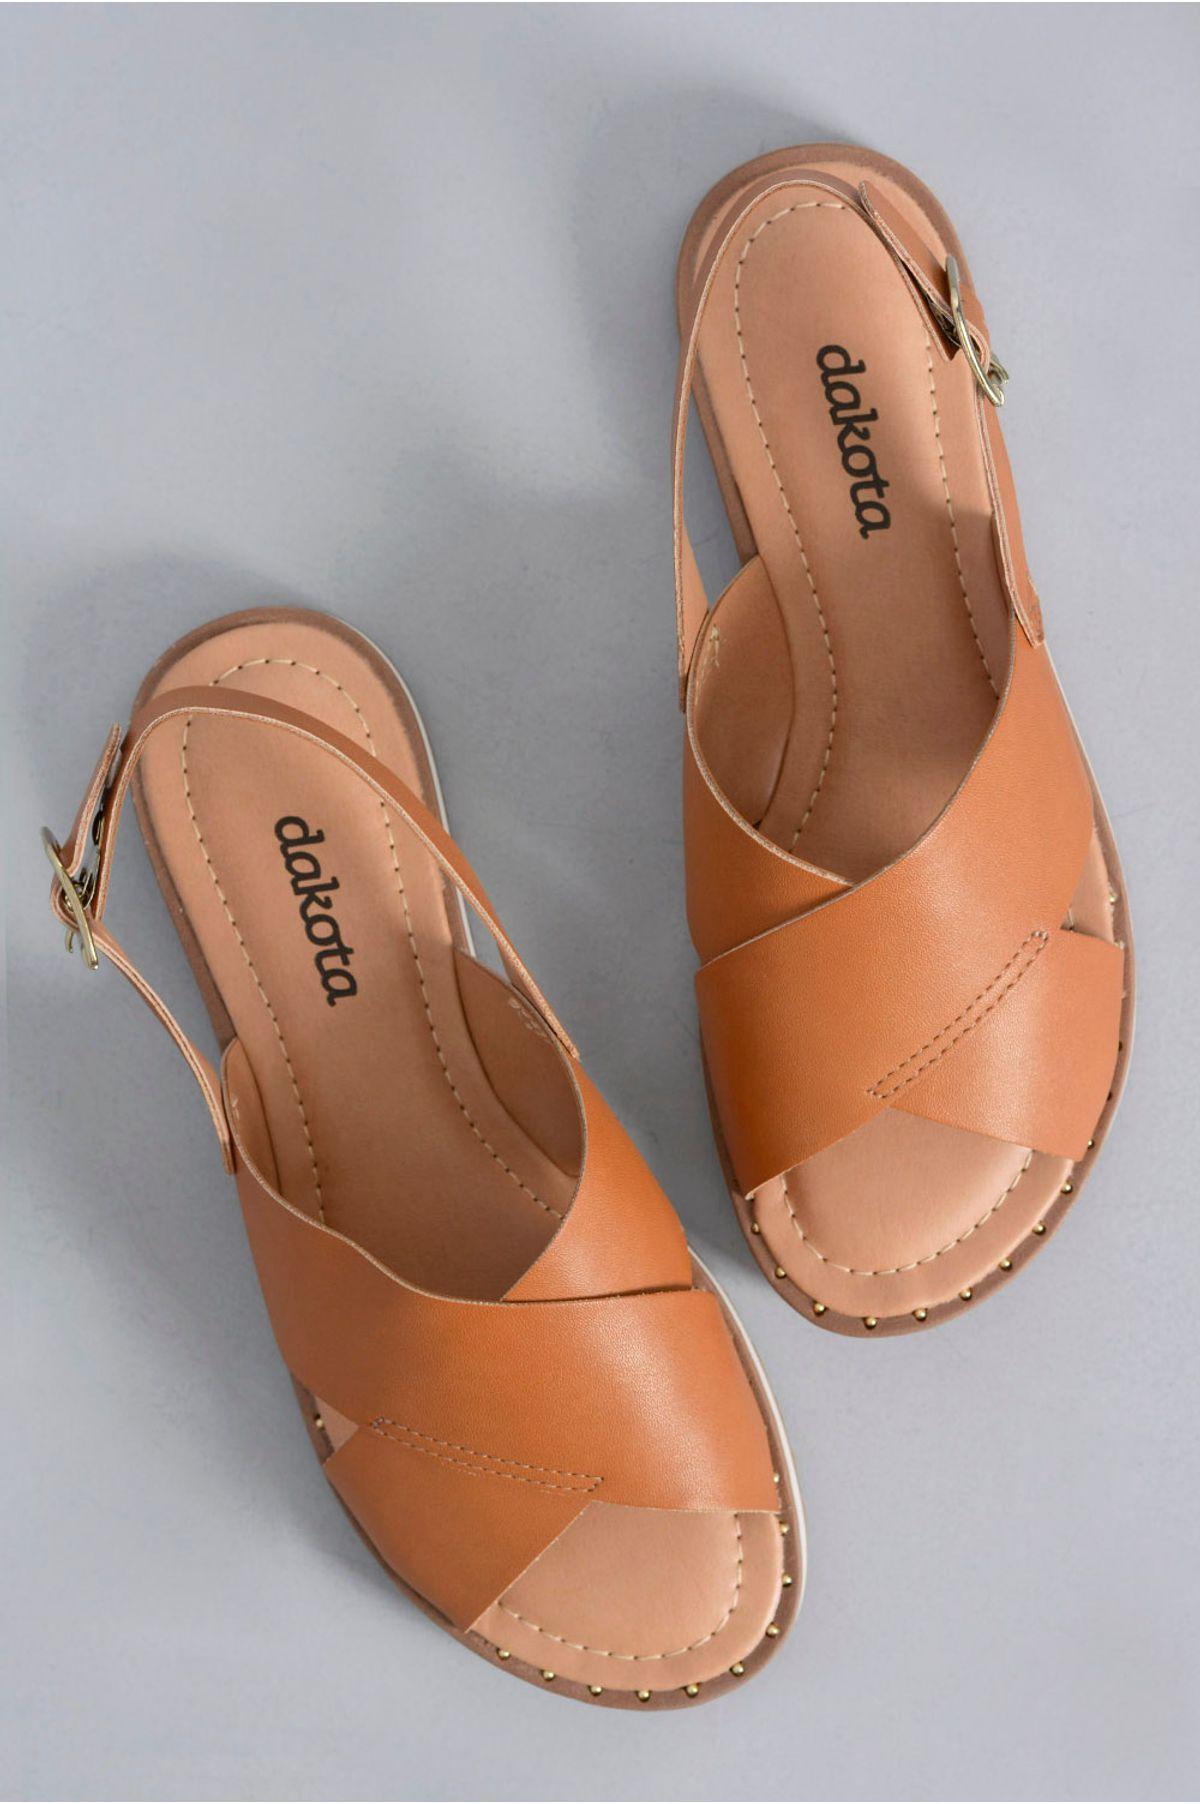 226f8cd9c Sandália Feminina Reyna Dakota SINT - CARAMELO - Mundial Calçados